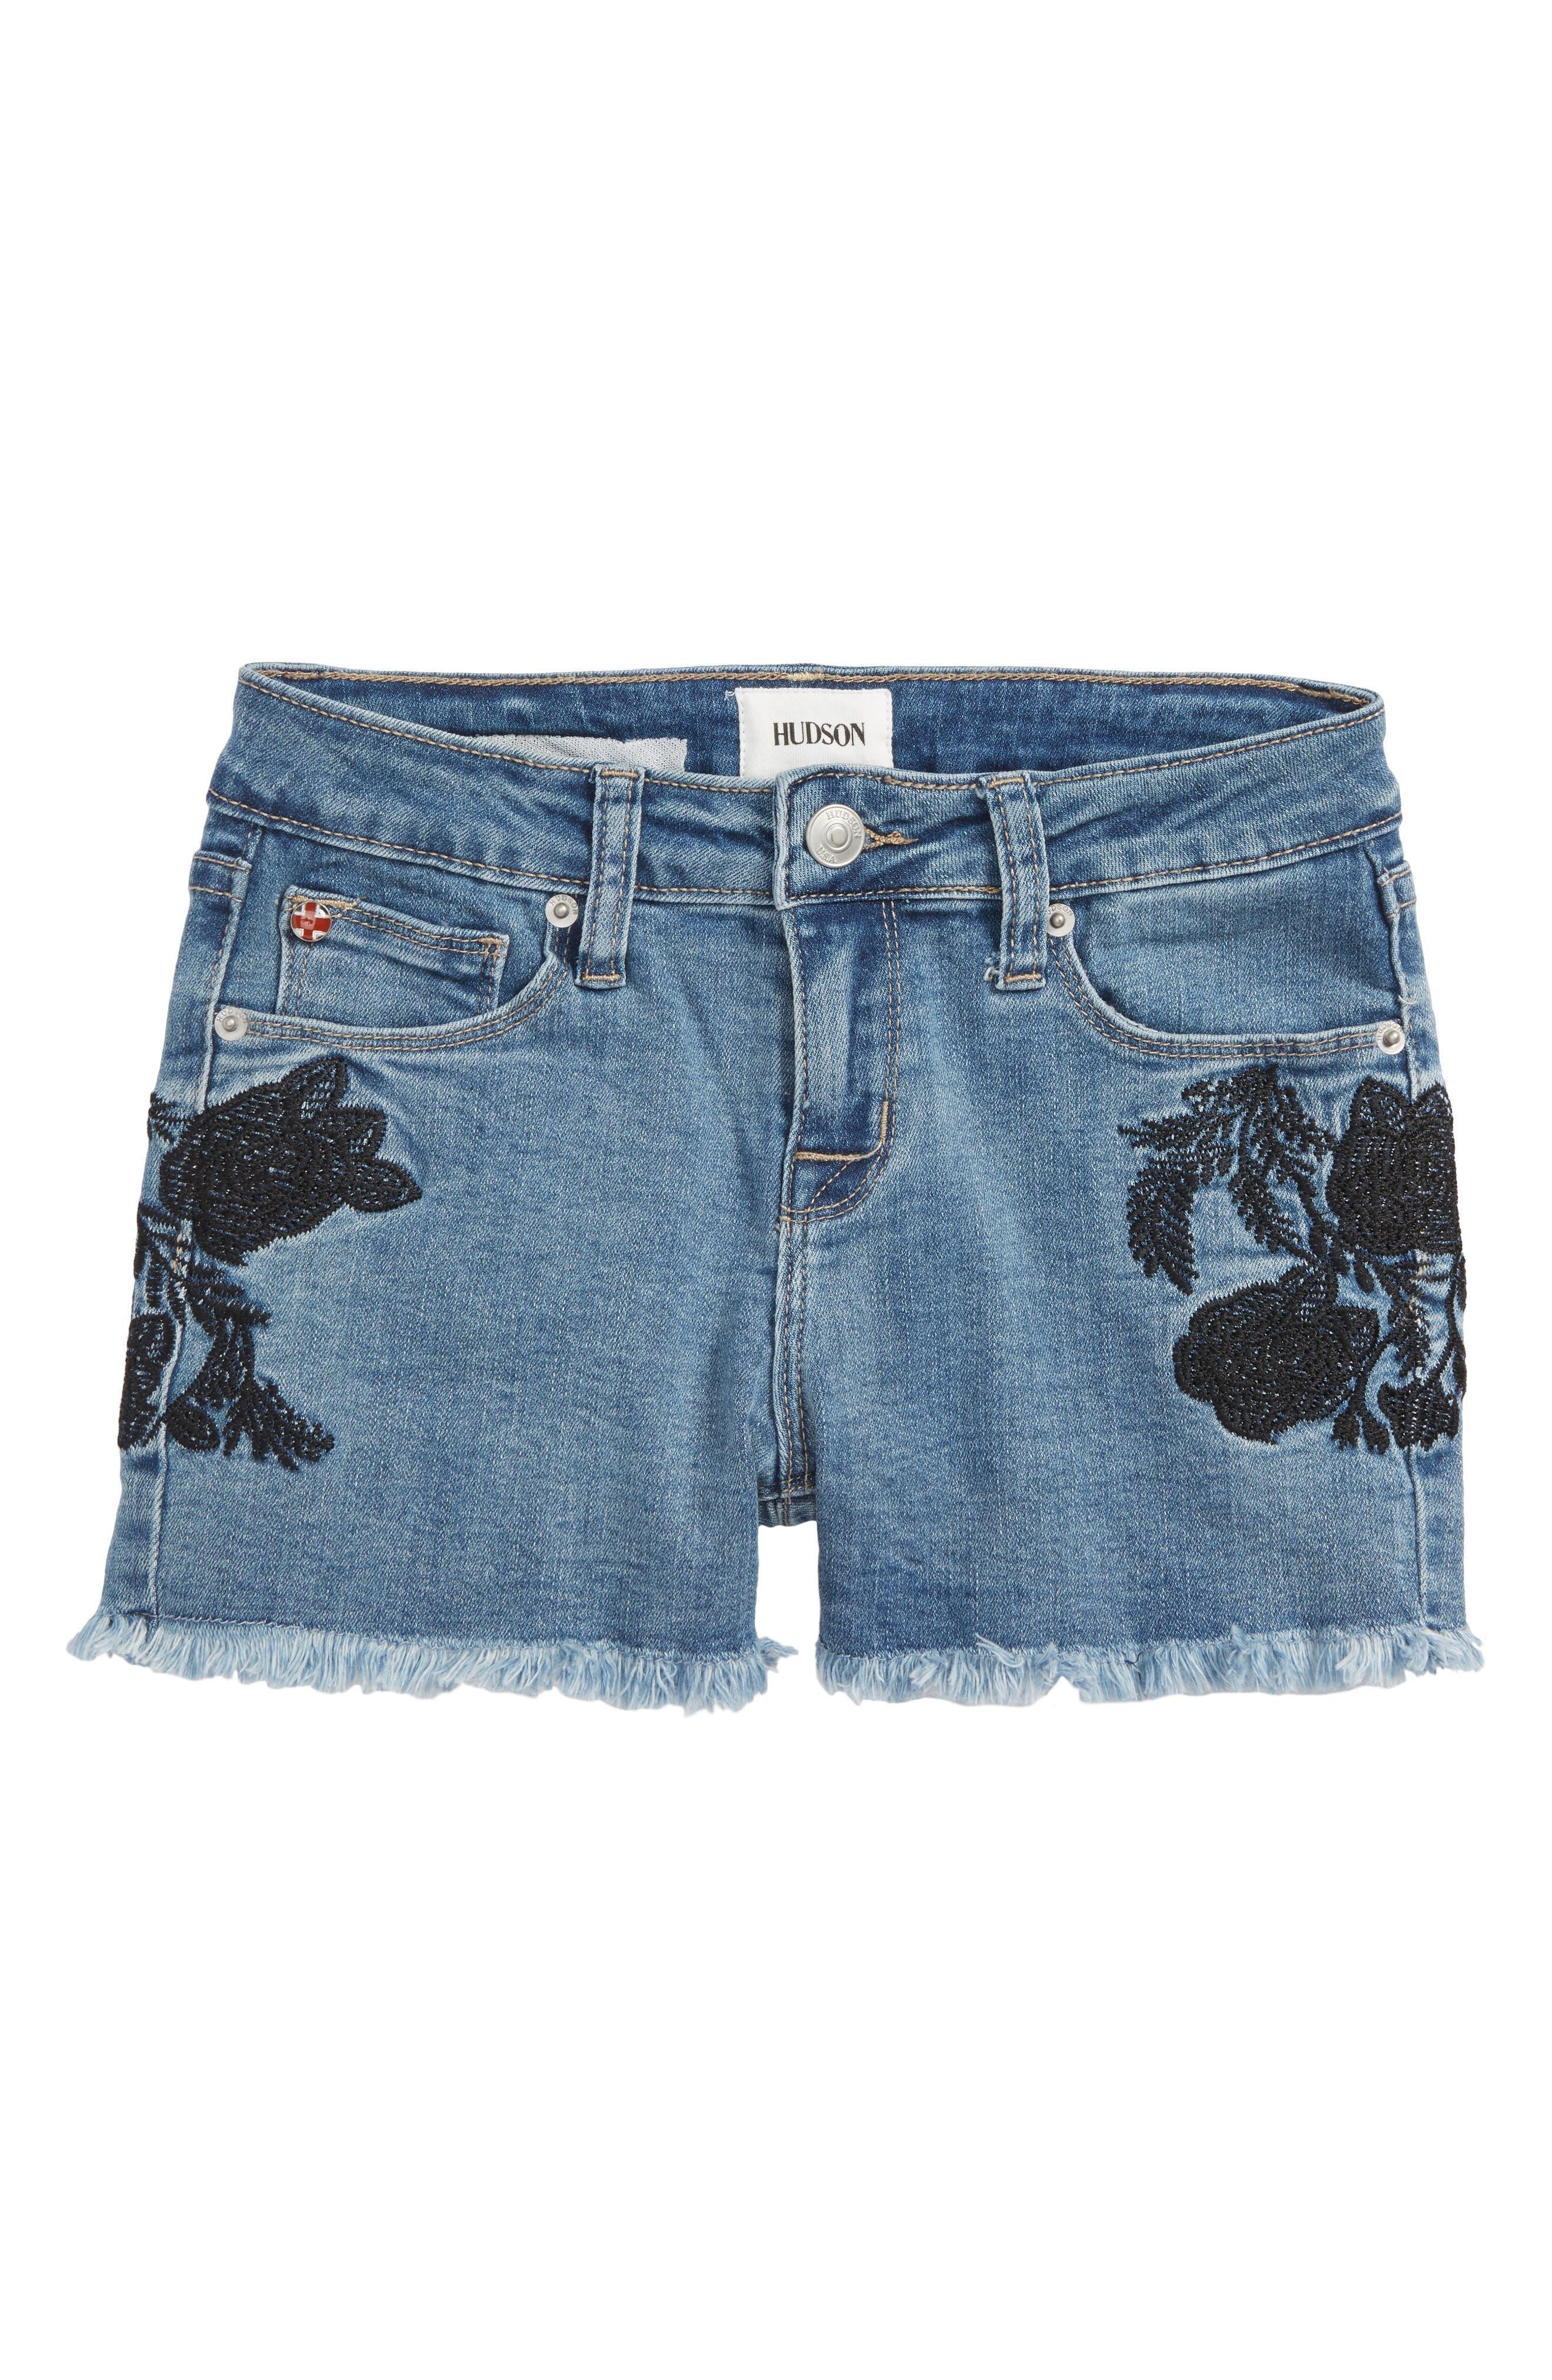 Floral Embroidery Frayed Hem Shorts,                             Main thumbnail 1, color,                             400